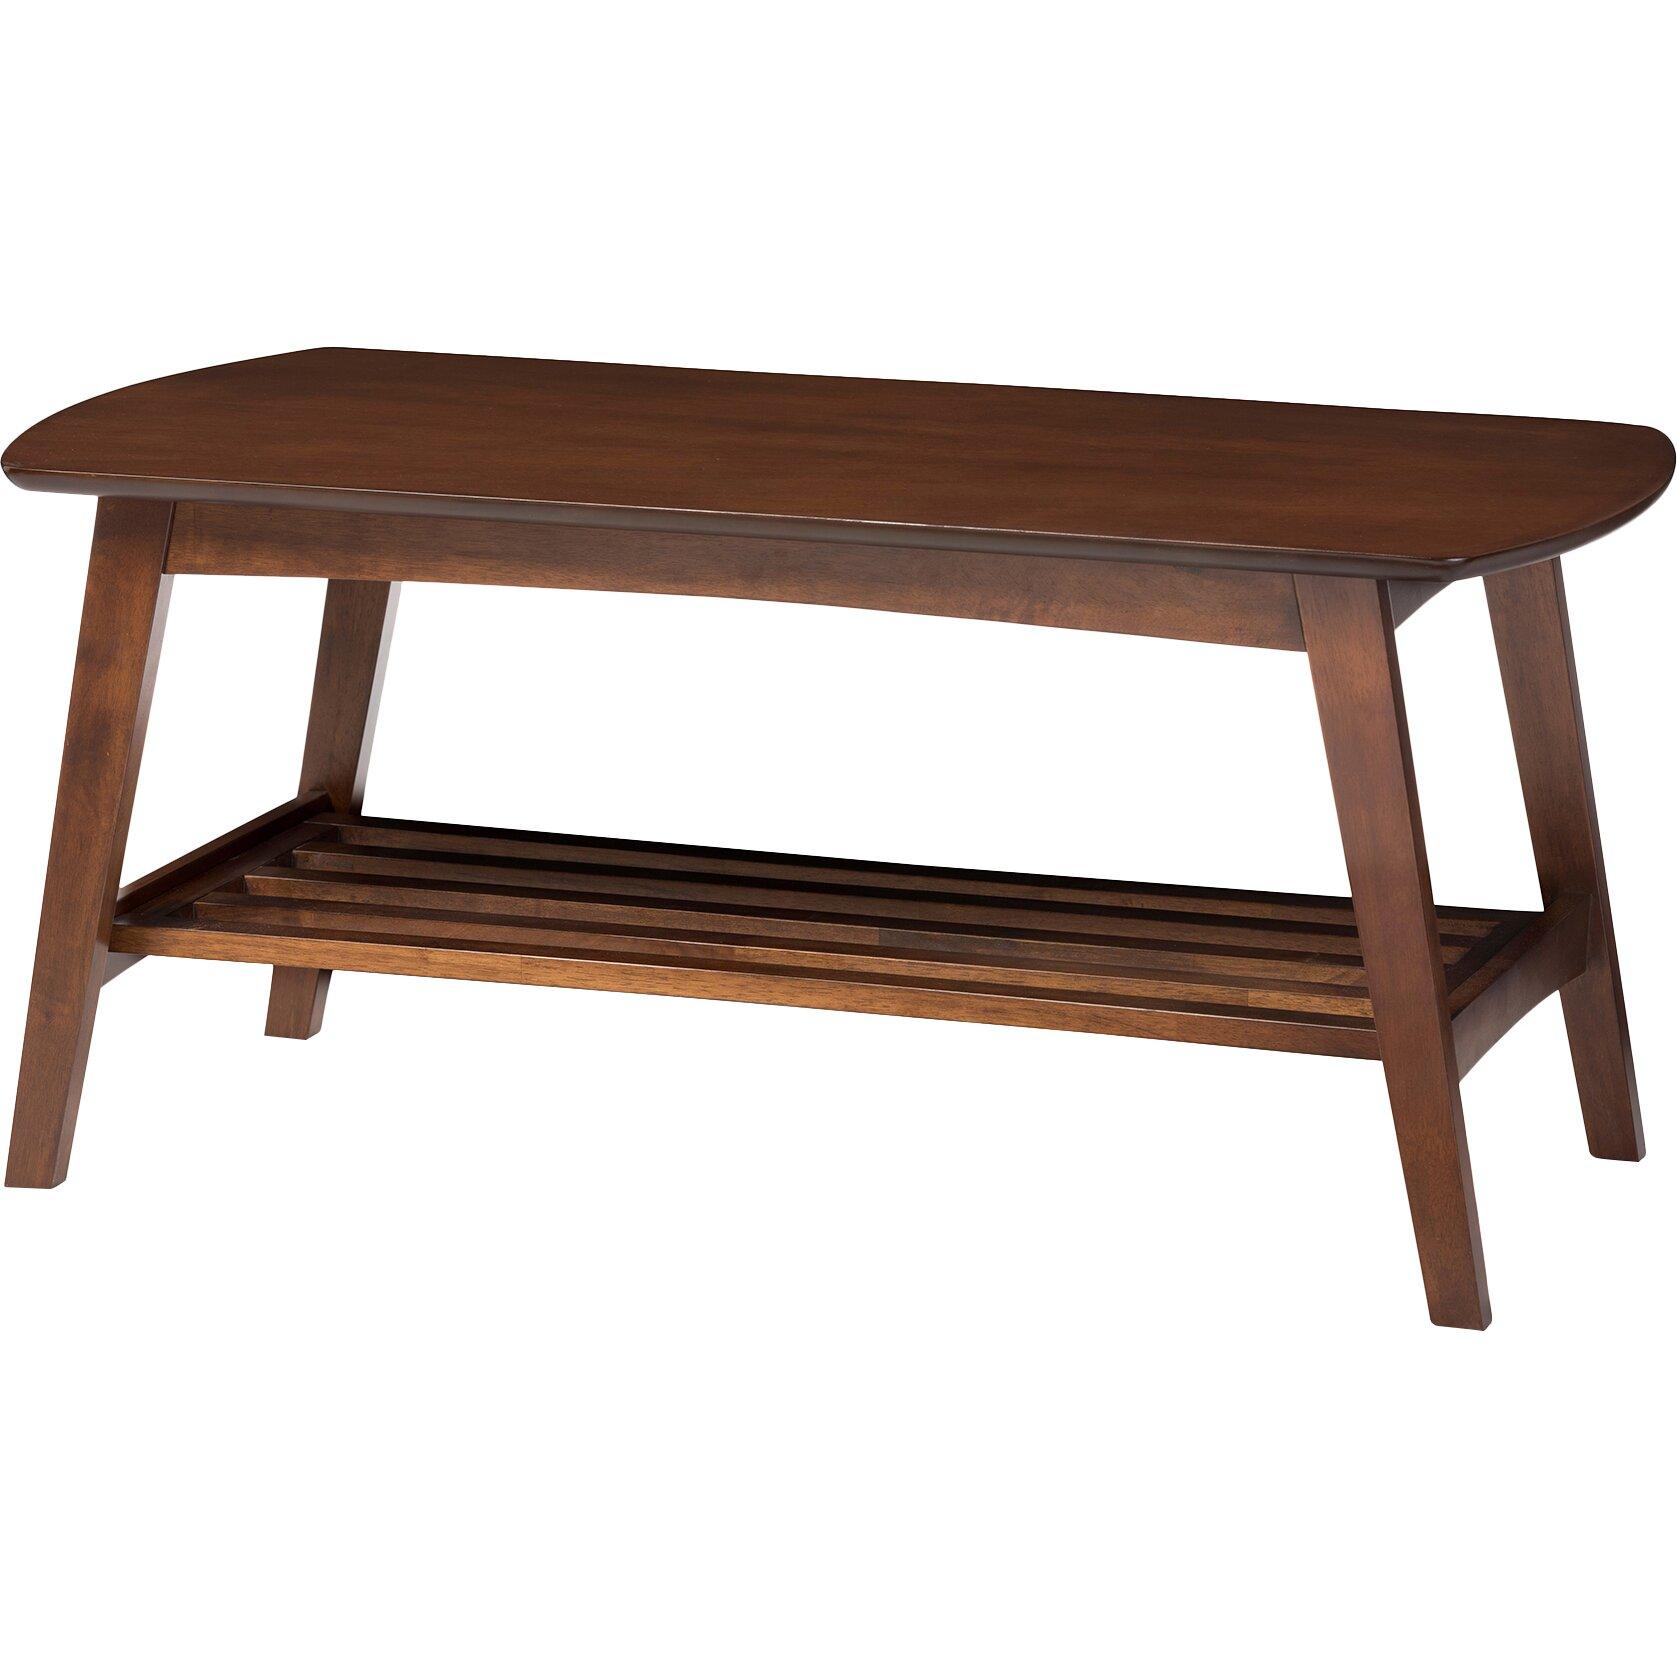 Http Www Wayfair Com Sacramento Mid Century Modern Scandinavian Style Dark Walnut Coffee Table Rt295a Occ Whi7058 Html